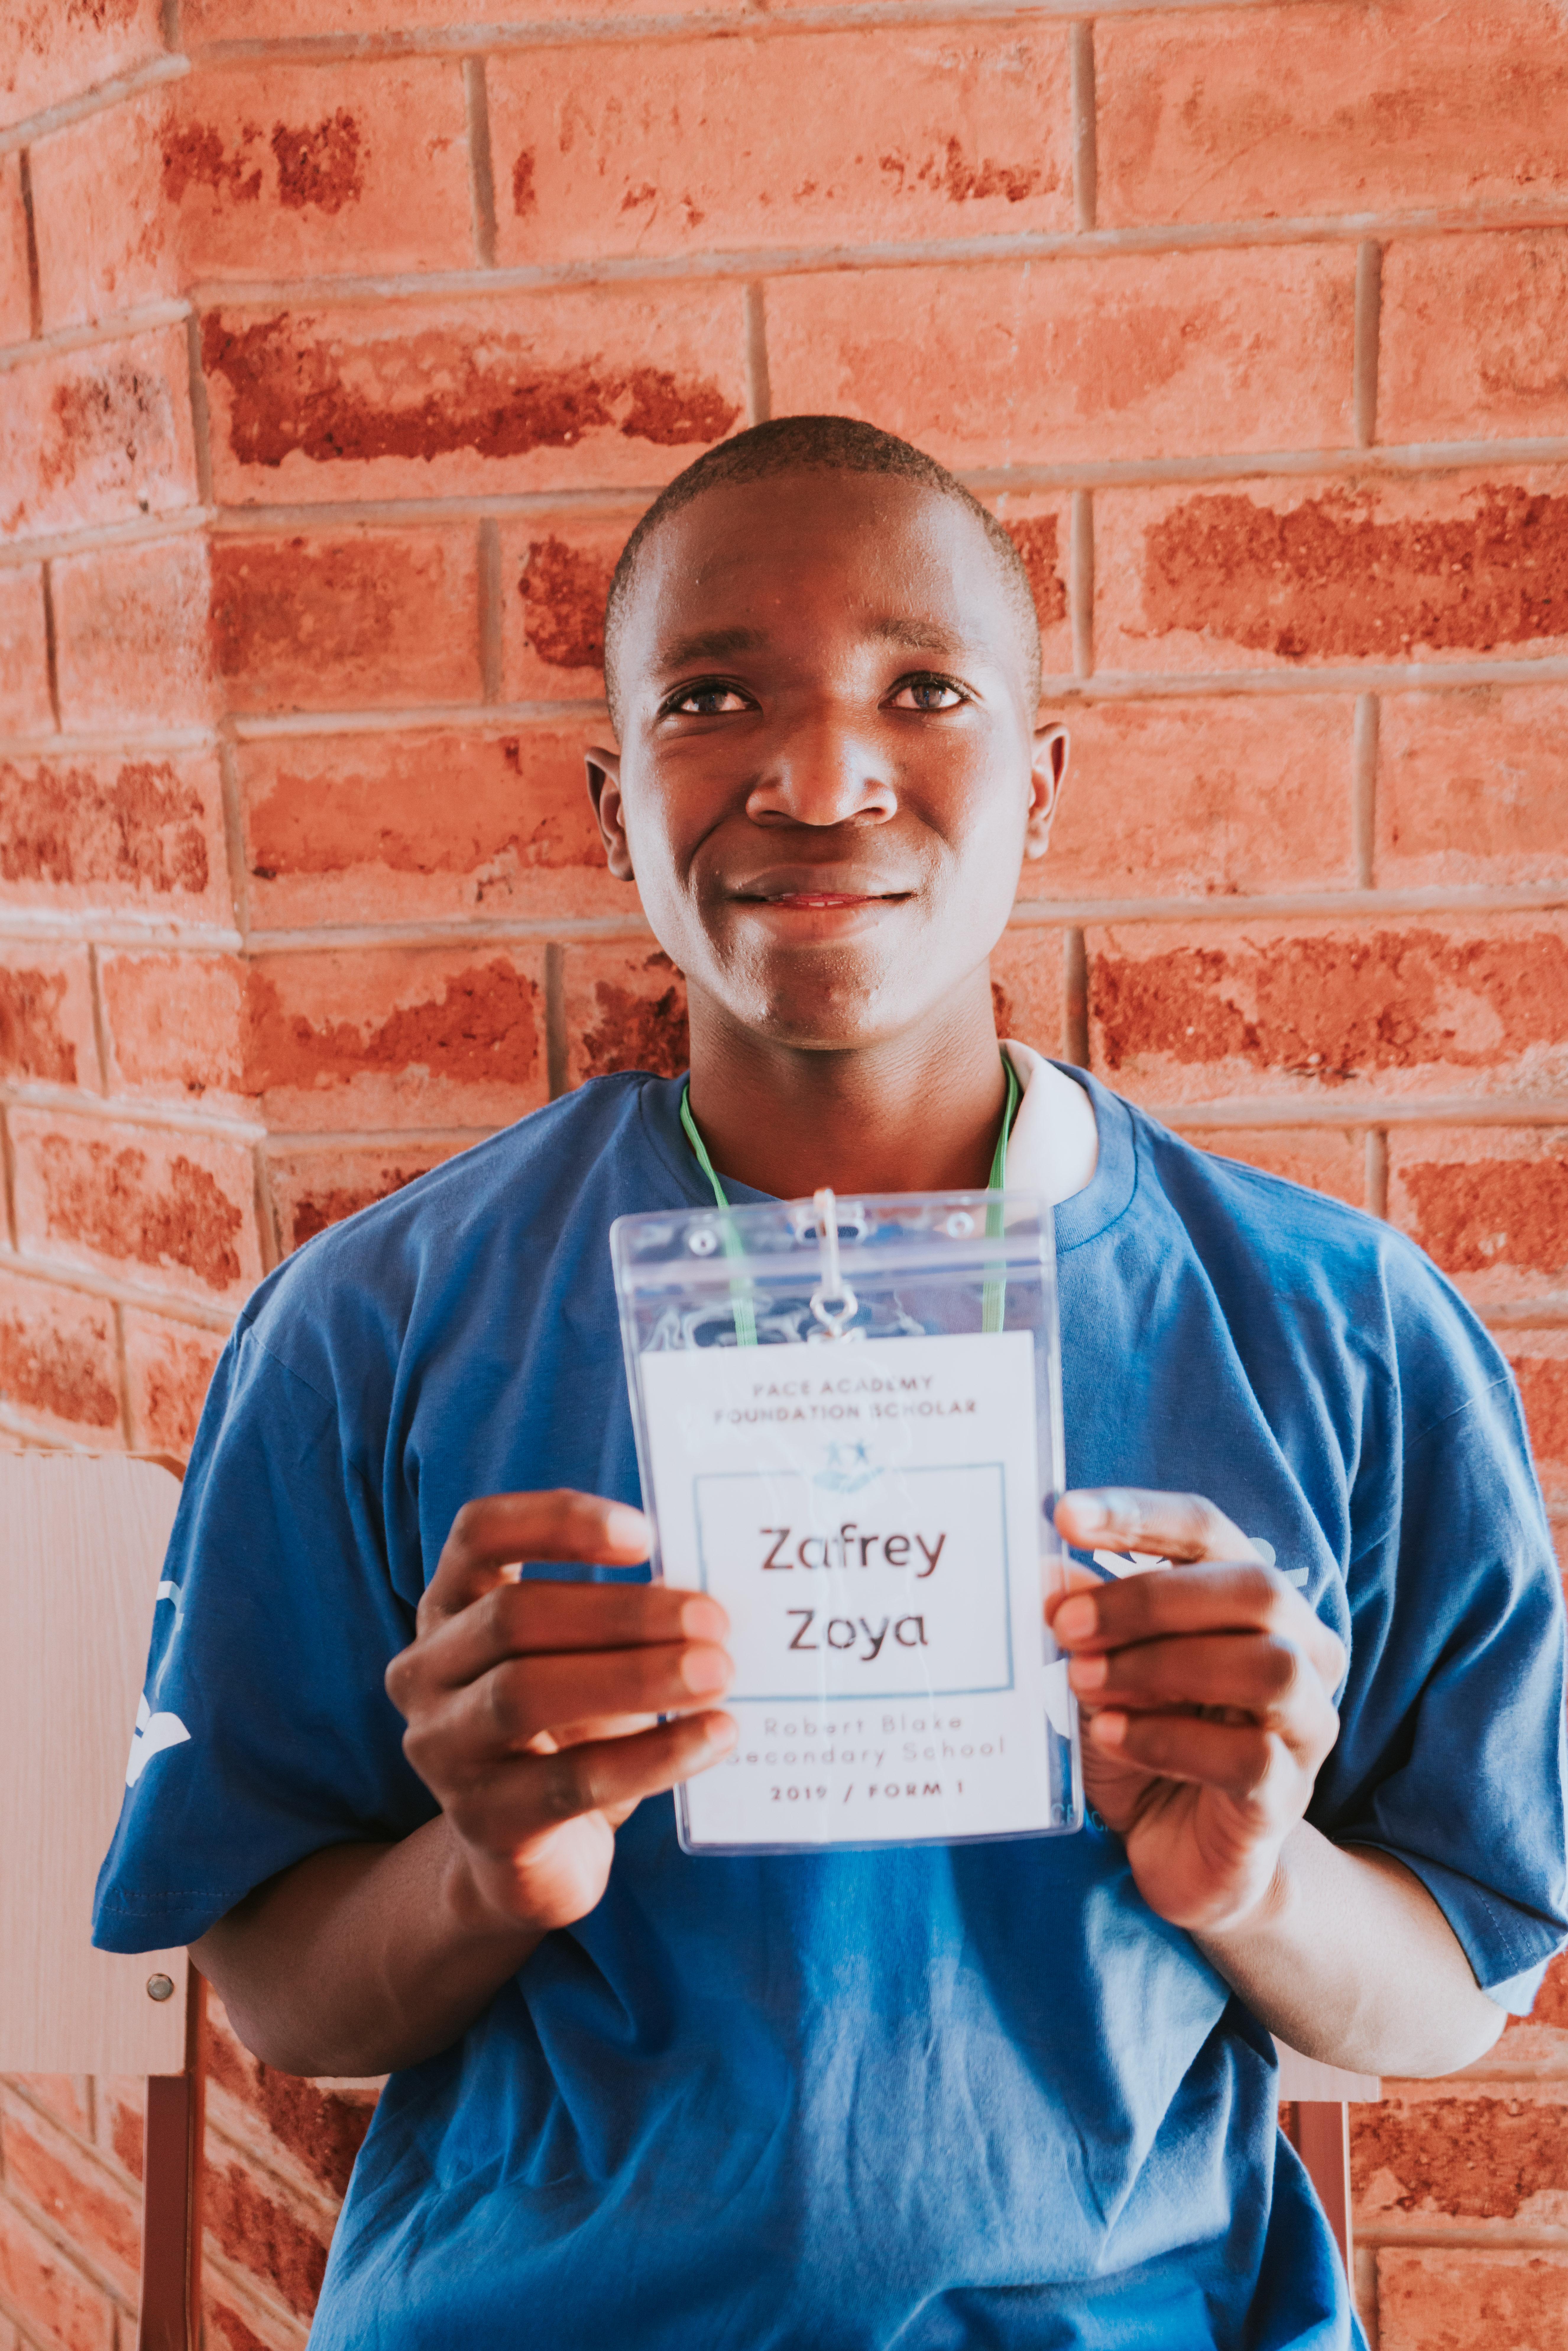 Zafrey Zoya (Robert Blake Secondary Scho